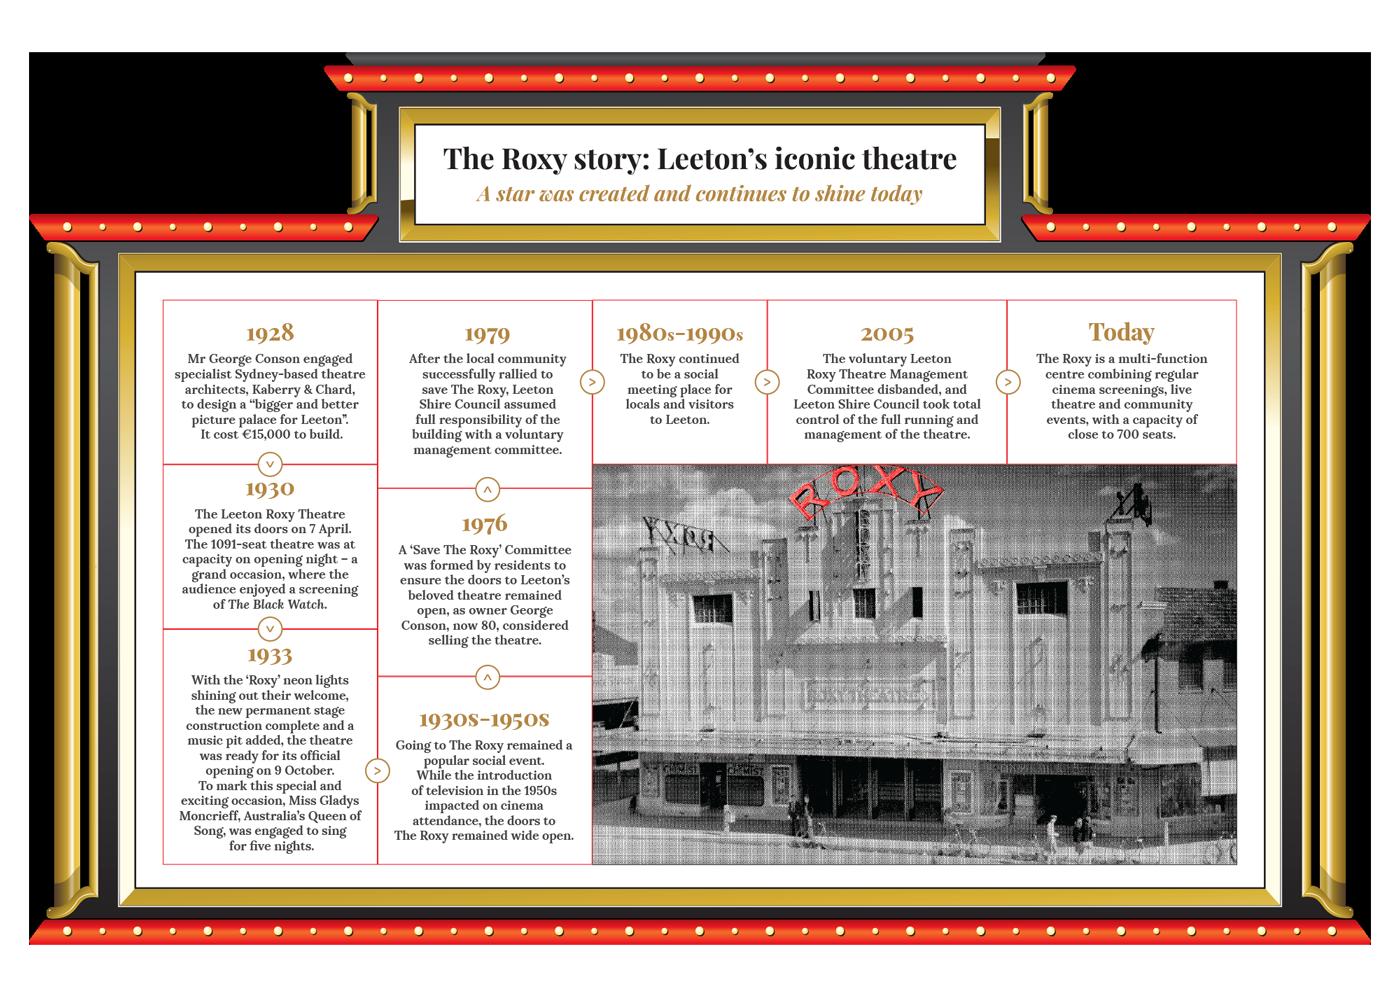 The Roxy historical timeline